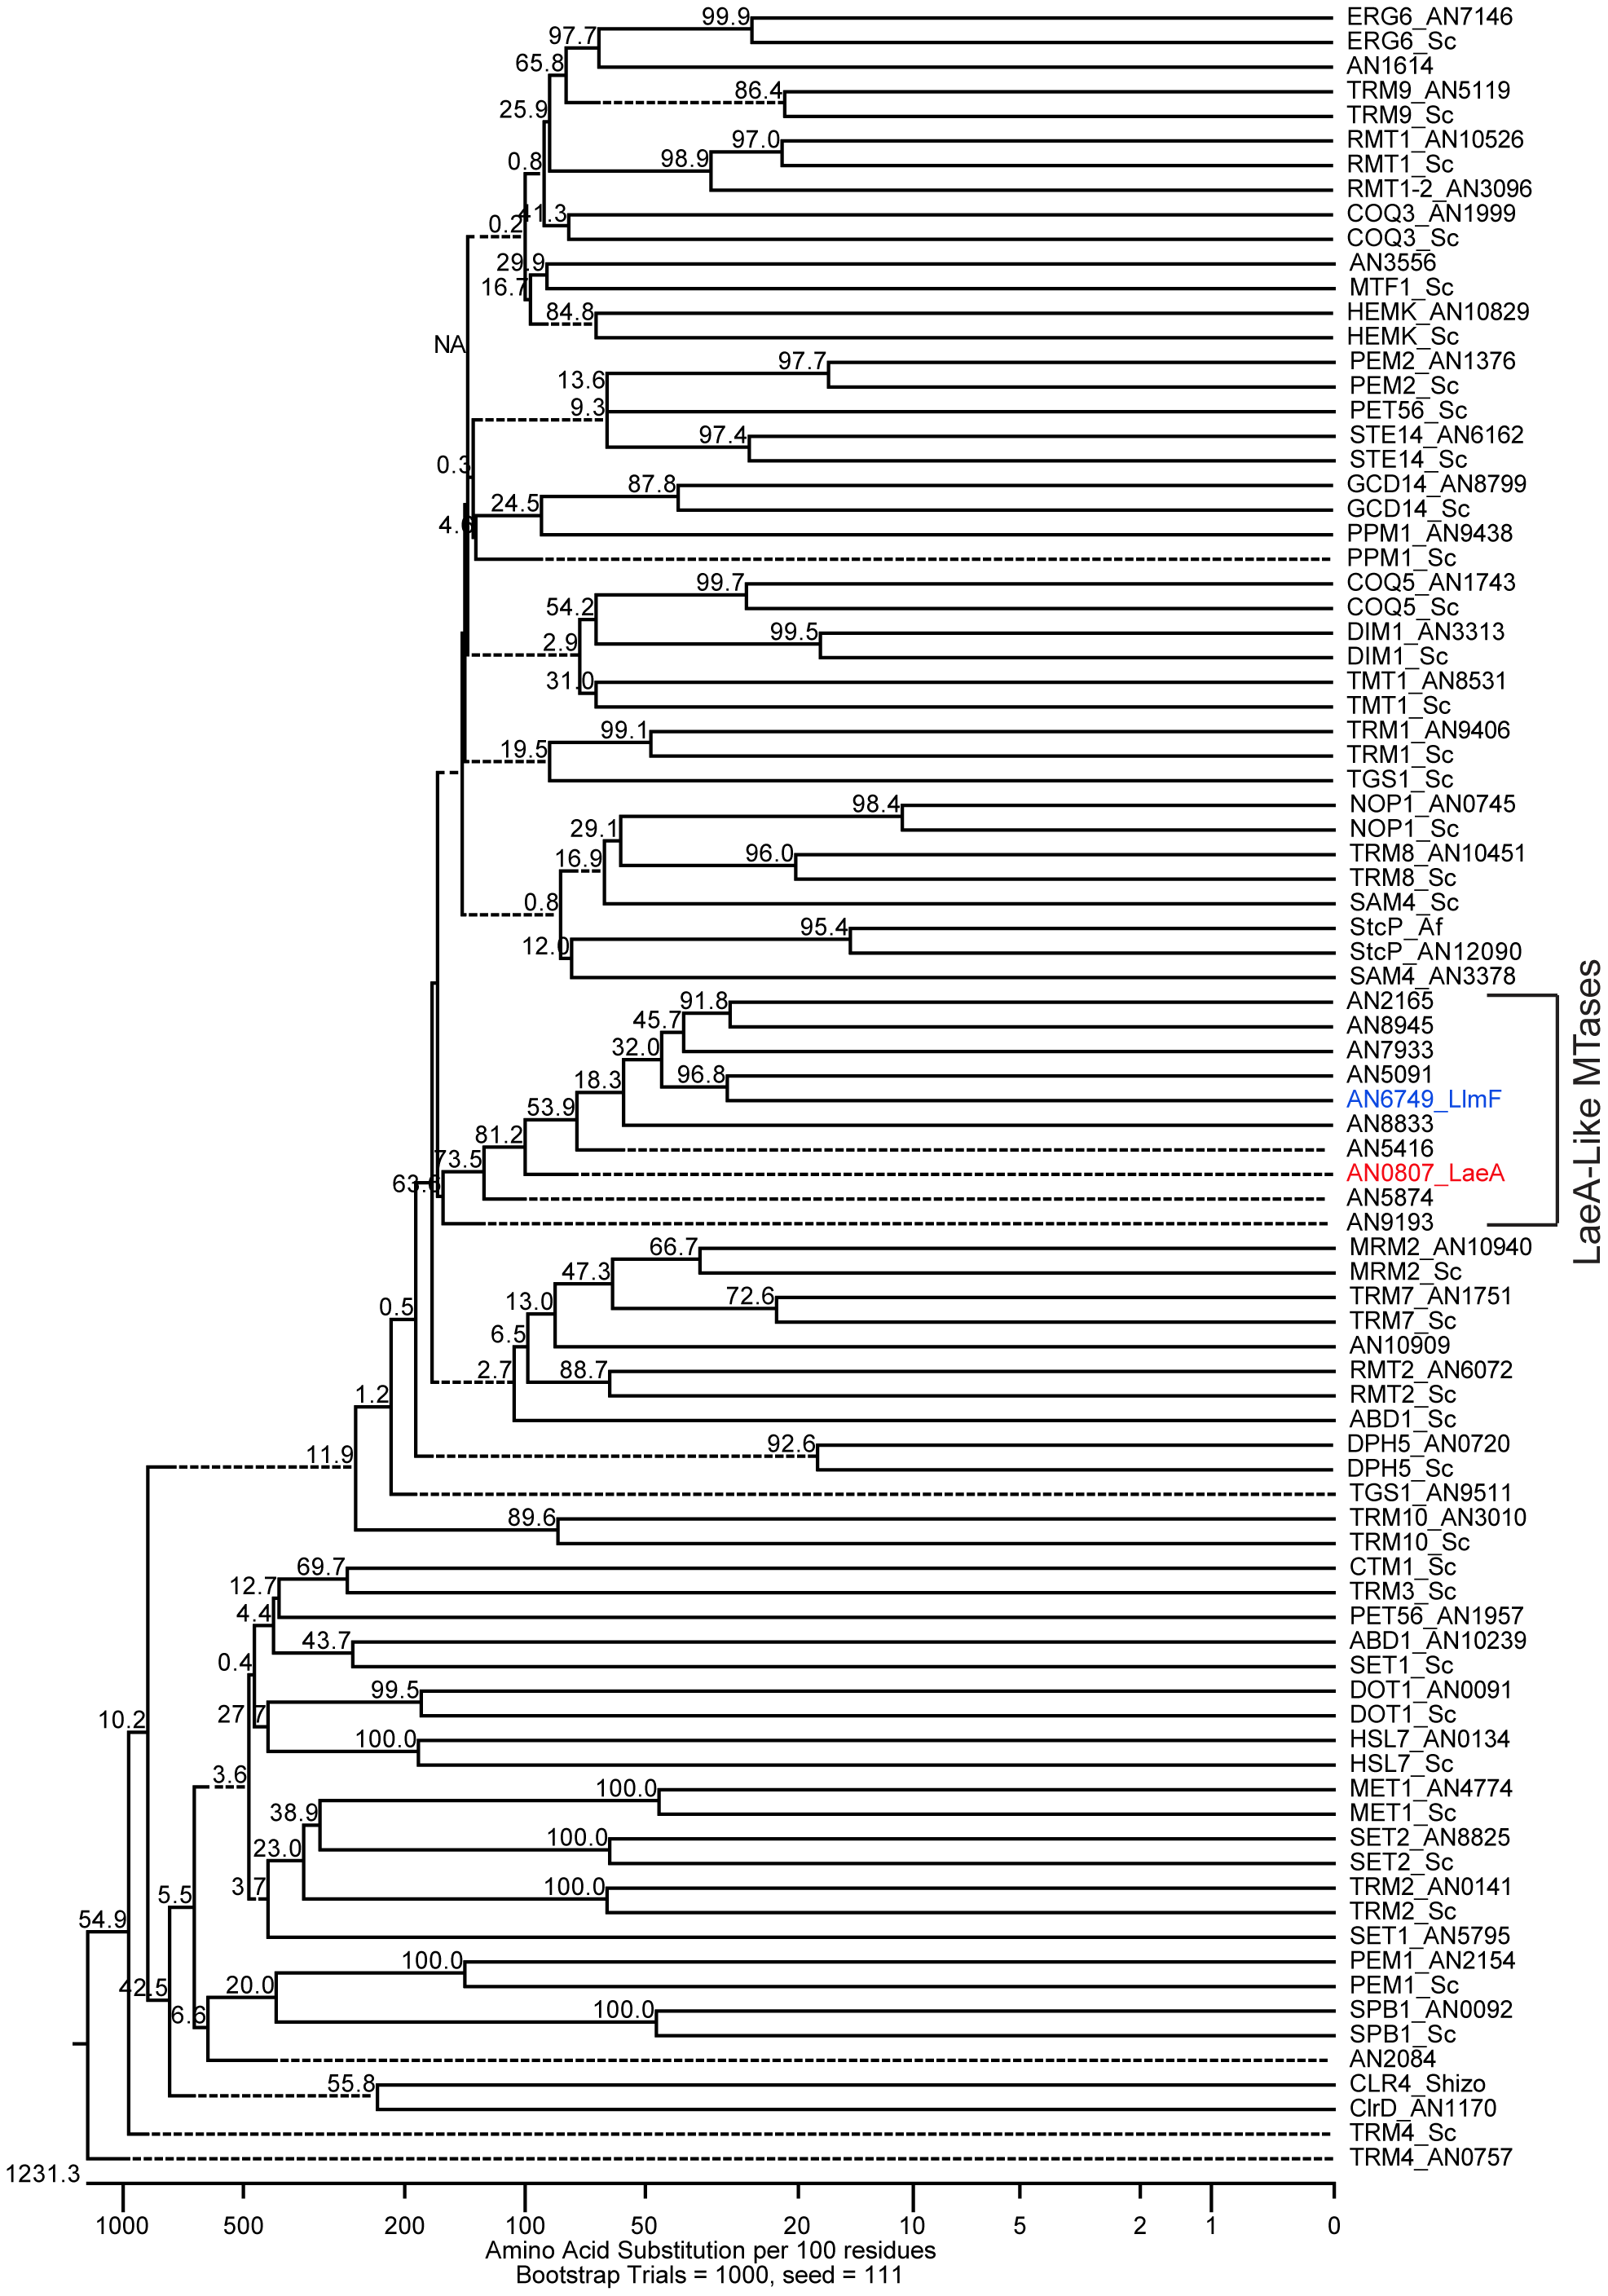 Reverse genetics identified LaeA-like methyltransferases in <i>A. nidulans</i>.